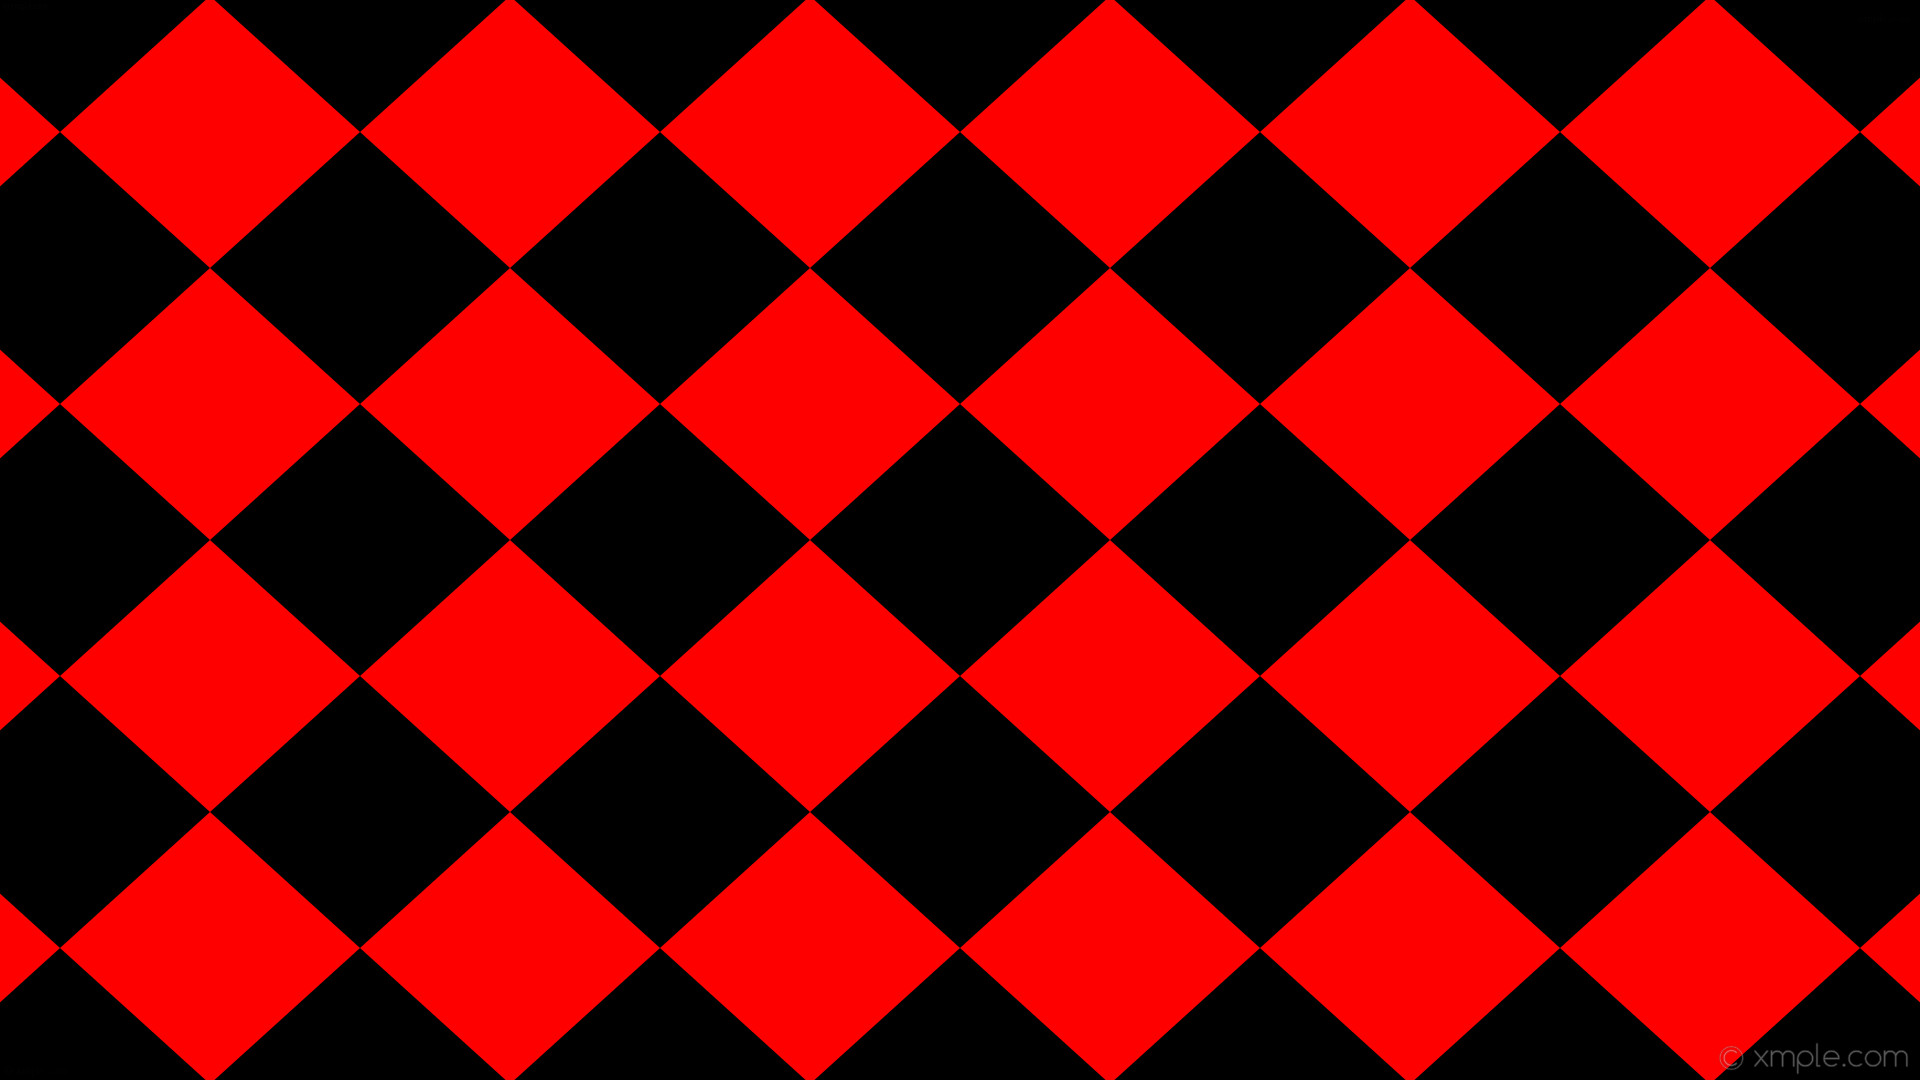 Res: 1920x1080, wallpaper rhombus black red diamond lozenge #000000 #ff0000 0° 300px 272px